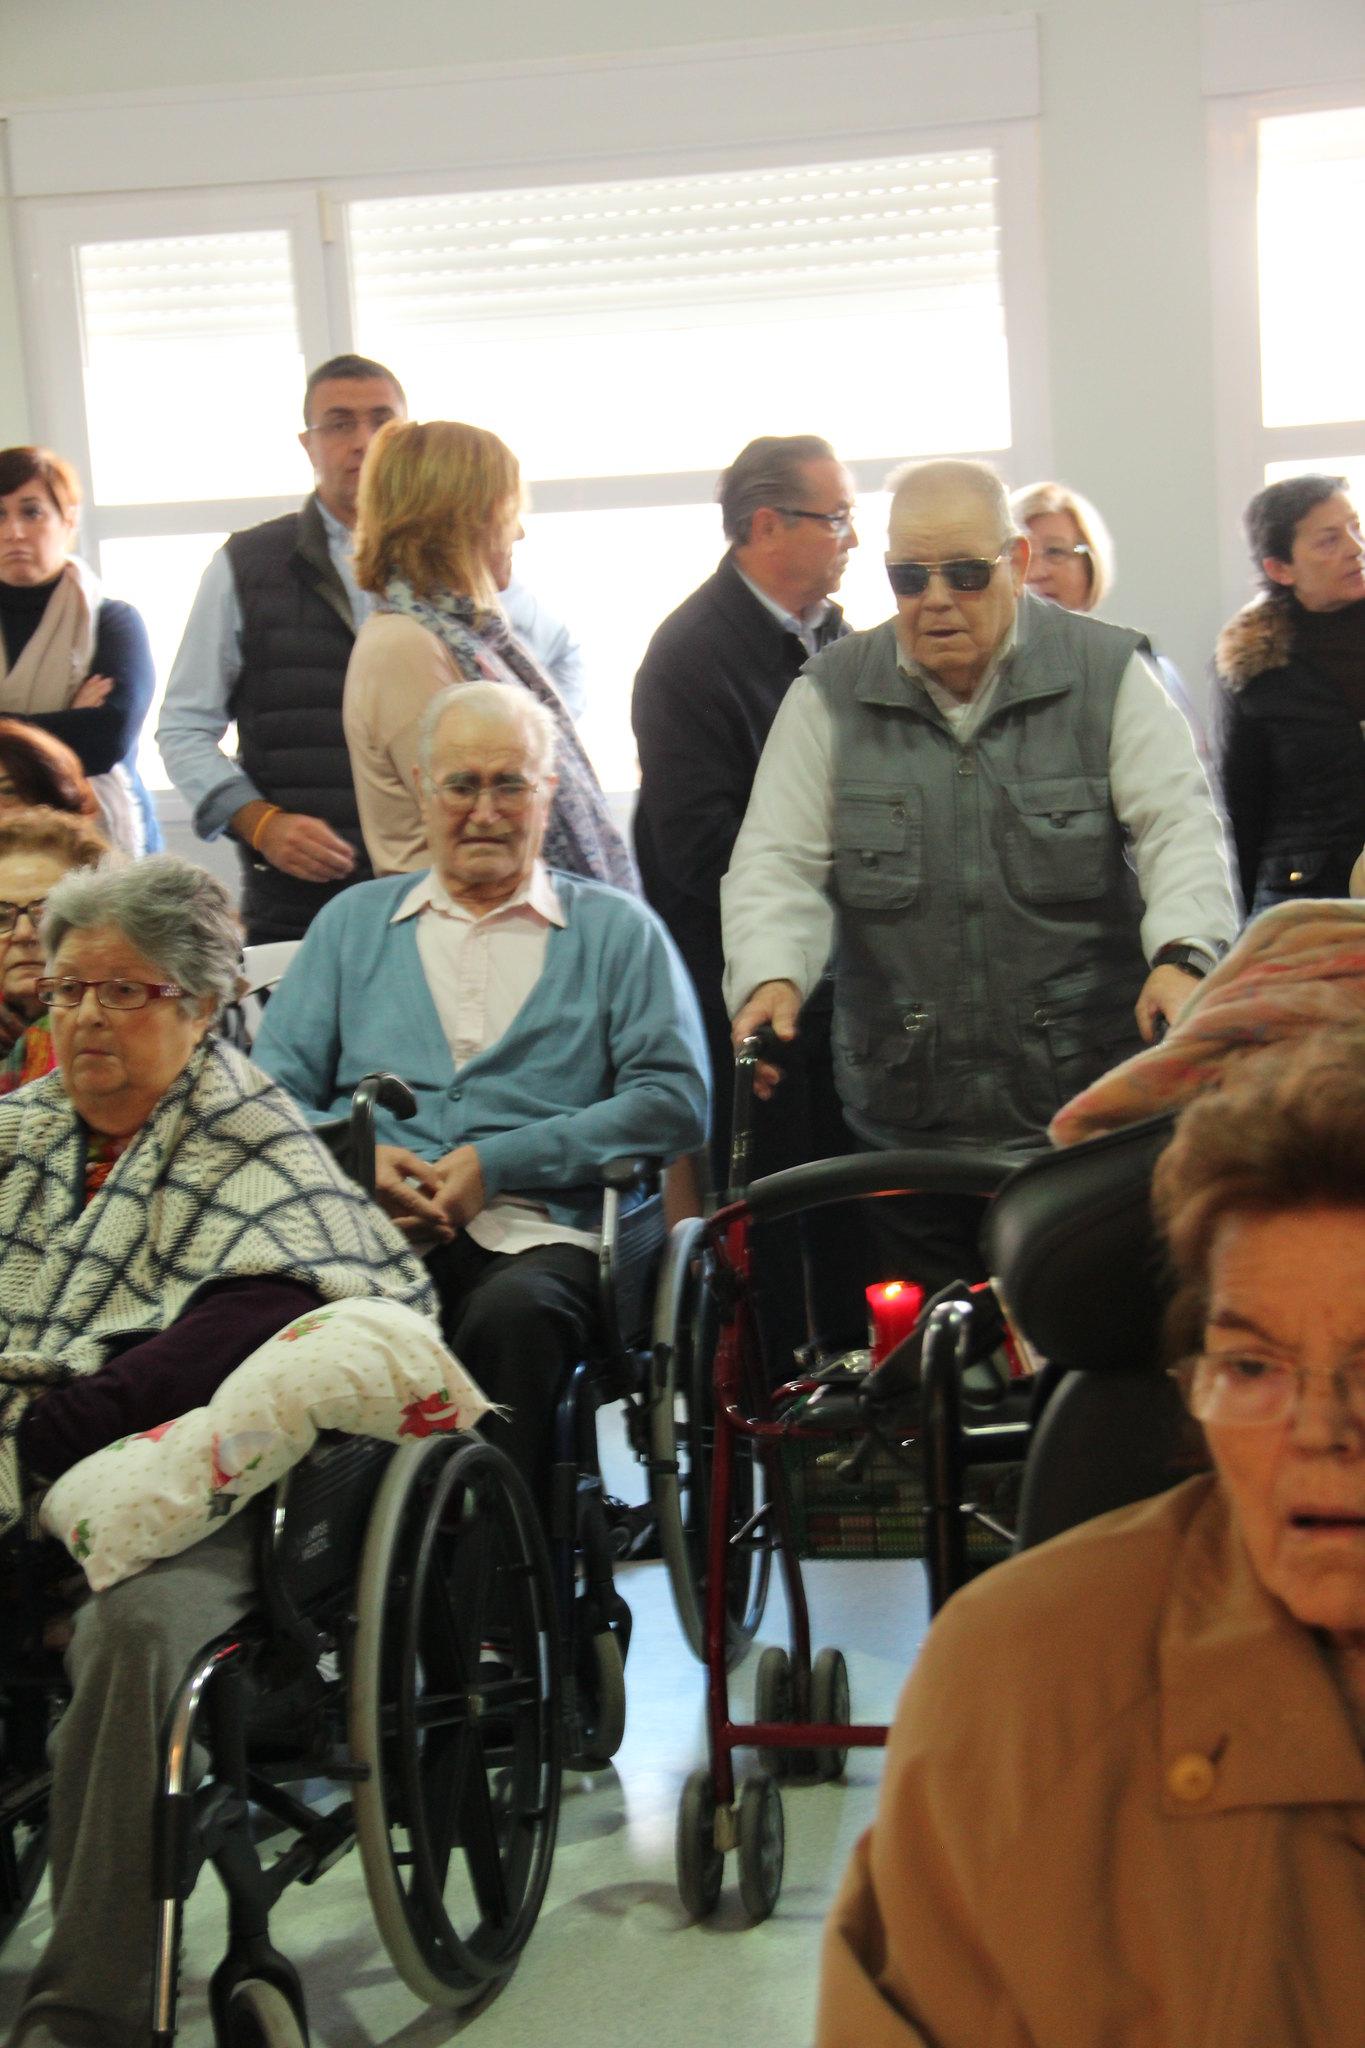 (2016-02-13) - Inauguración Virgen De Lourdes, La Molineta - Archivo La Molineta (033)